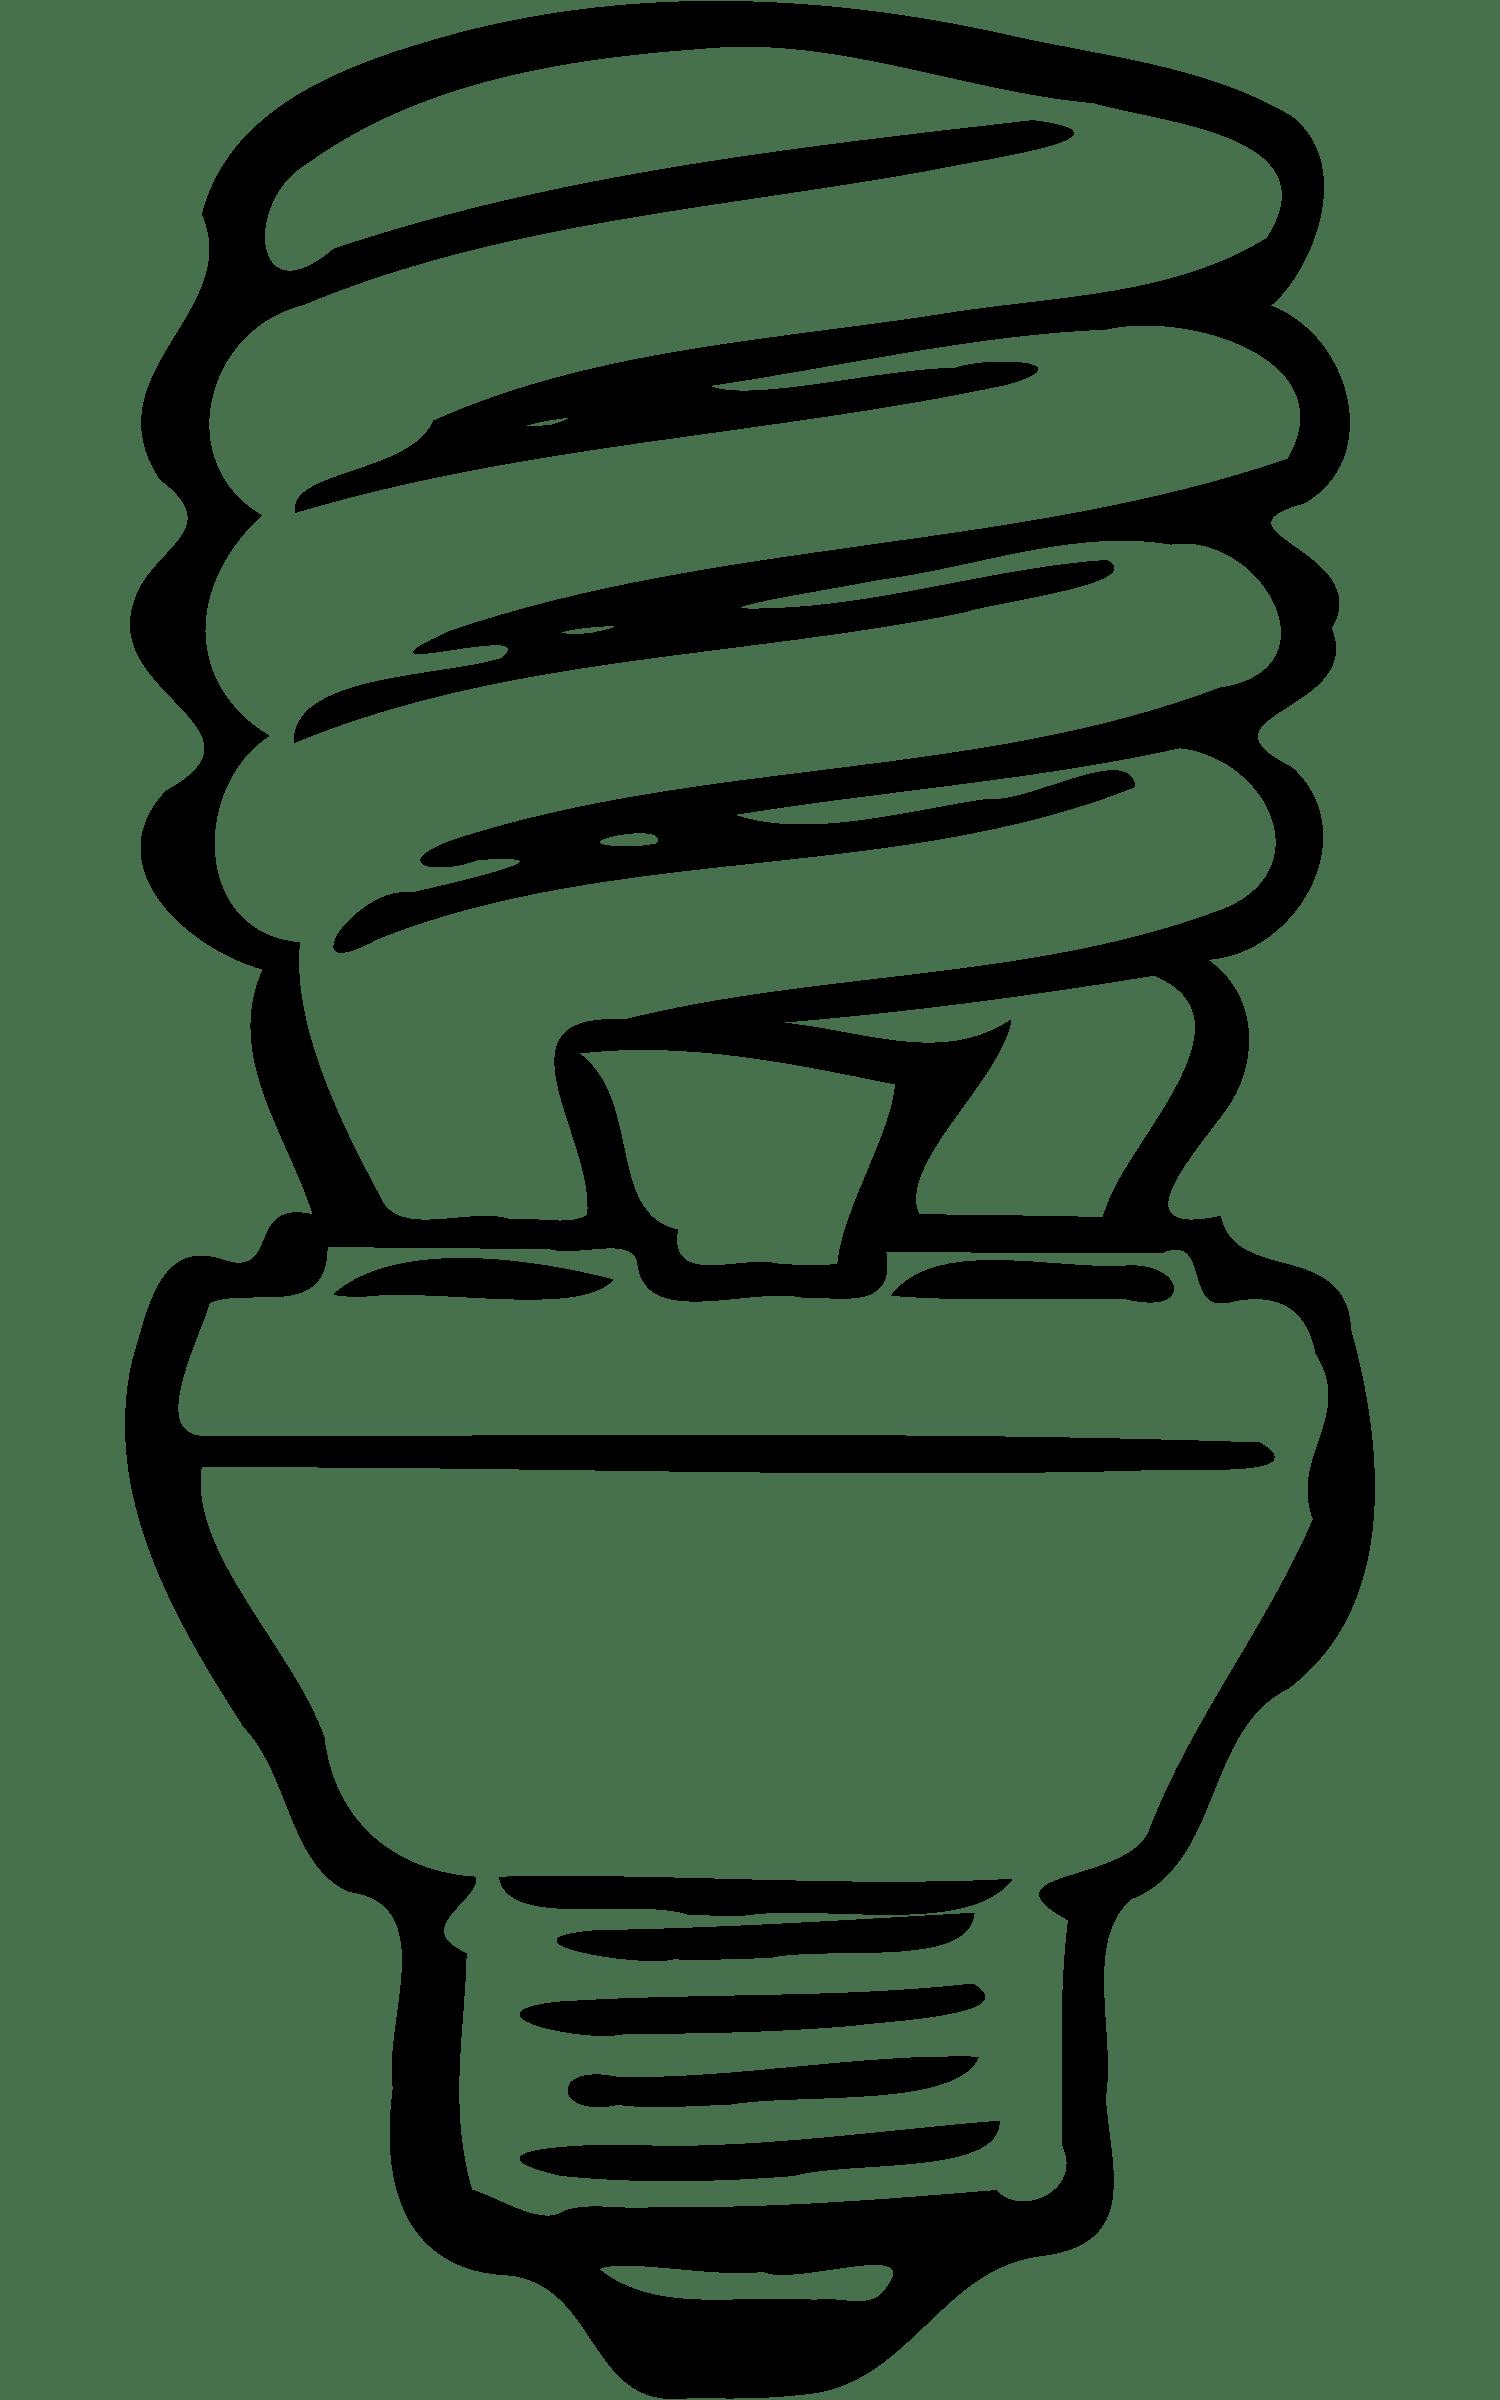 Cfl Light Bulb Clip Art Clipart Panda